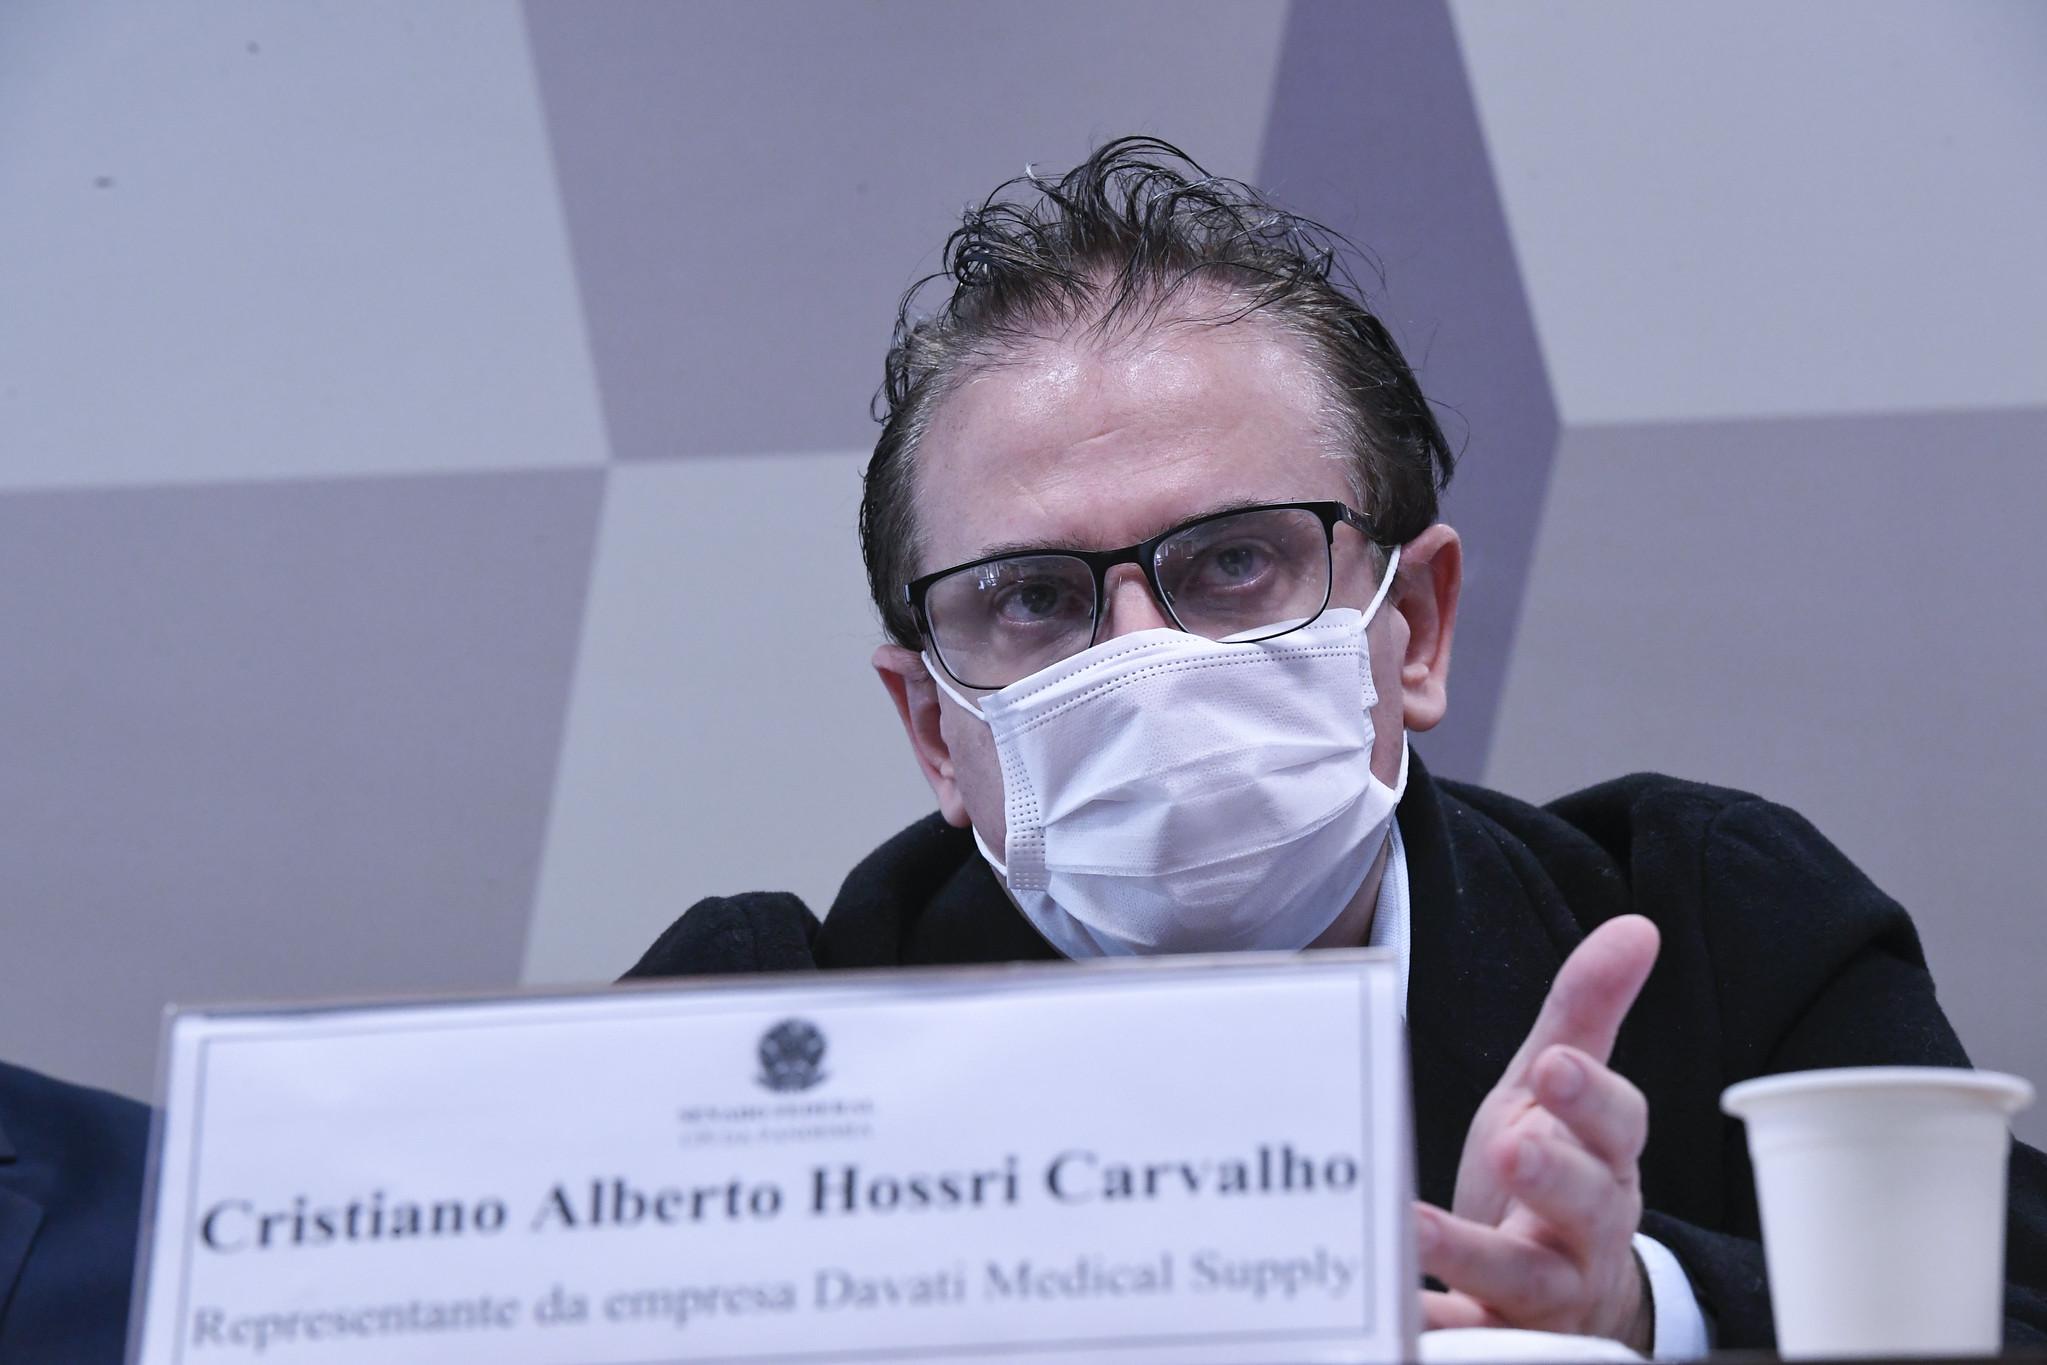 IMAGEM: Representante da Davati diz que Dominguetti usou áudio de Miranda de forma 'absurda'